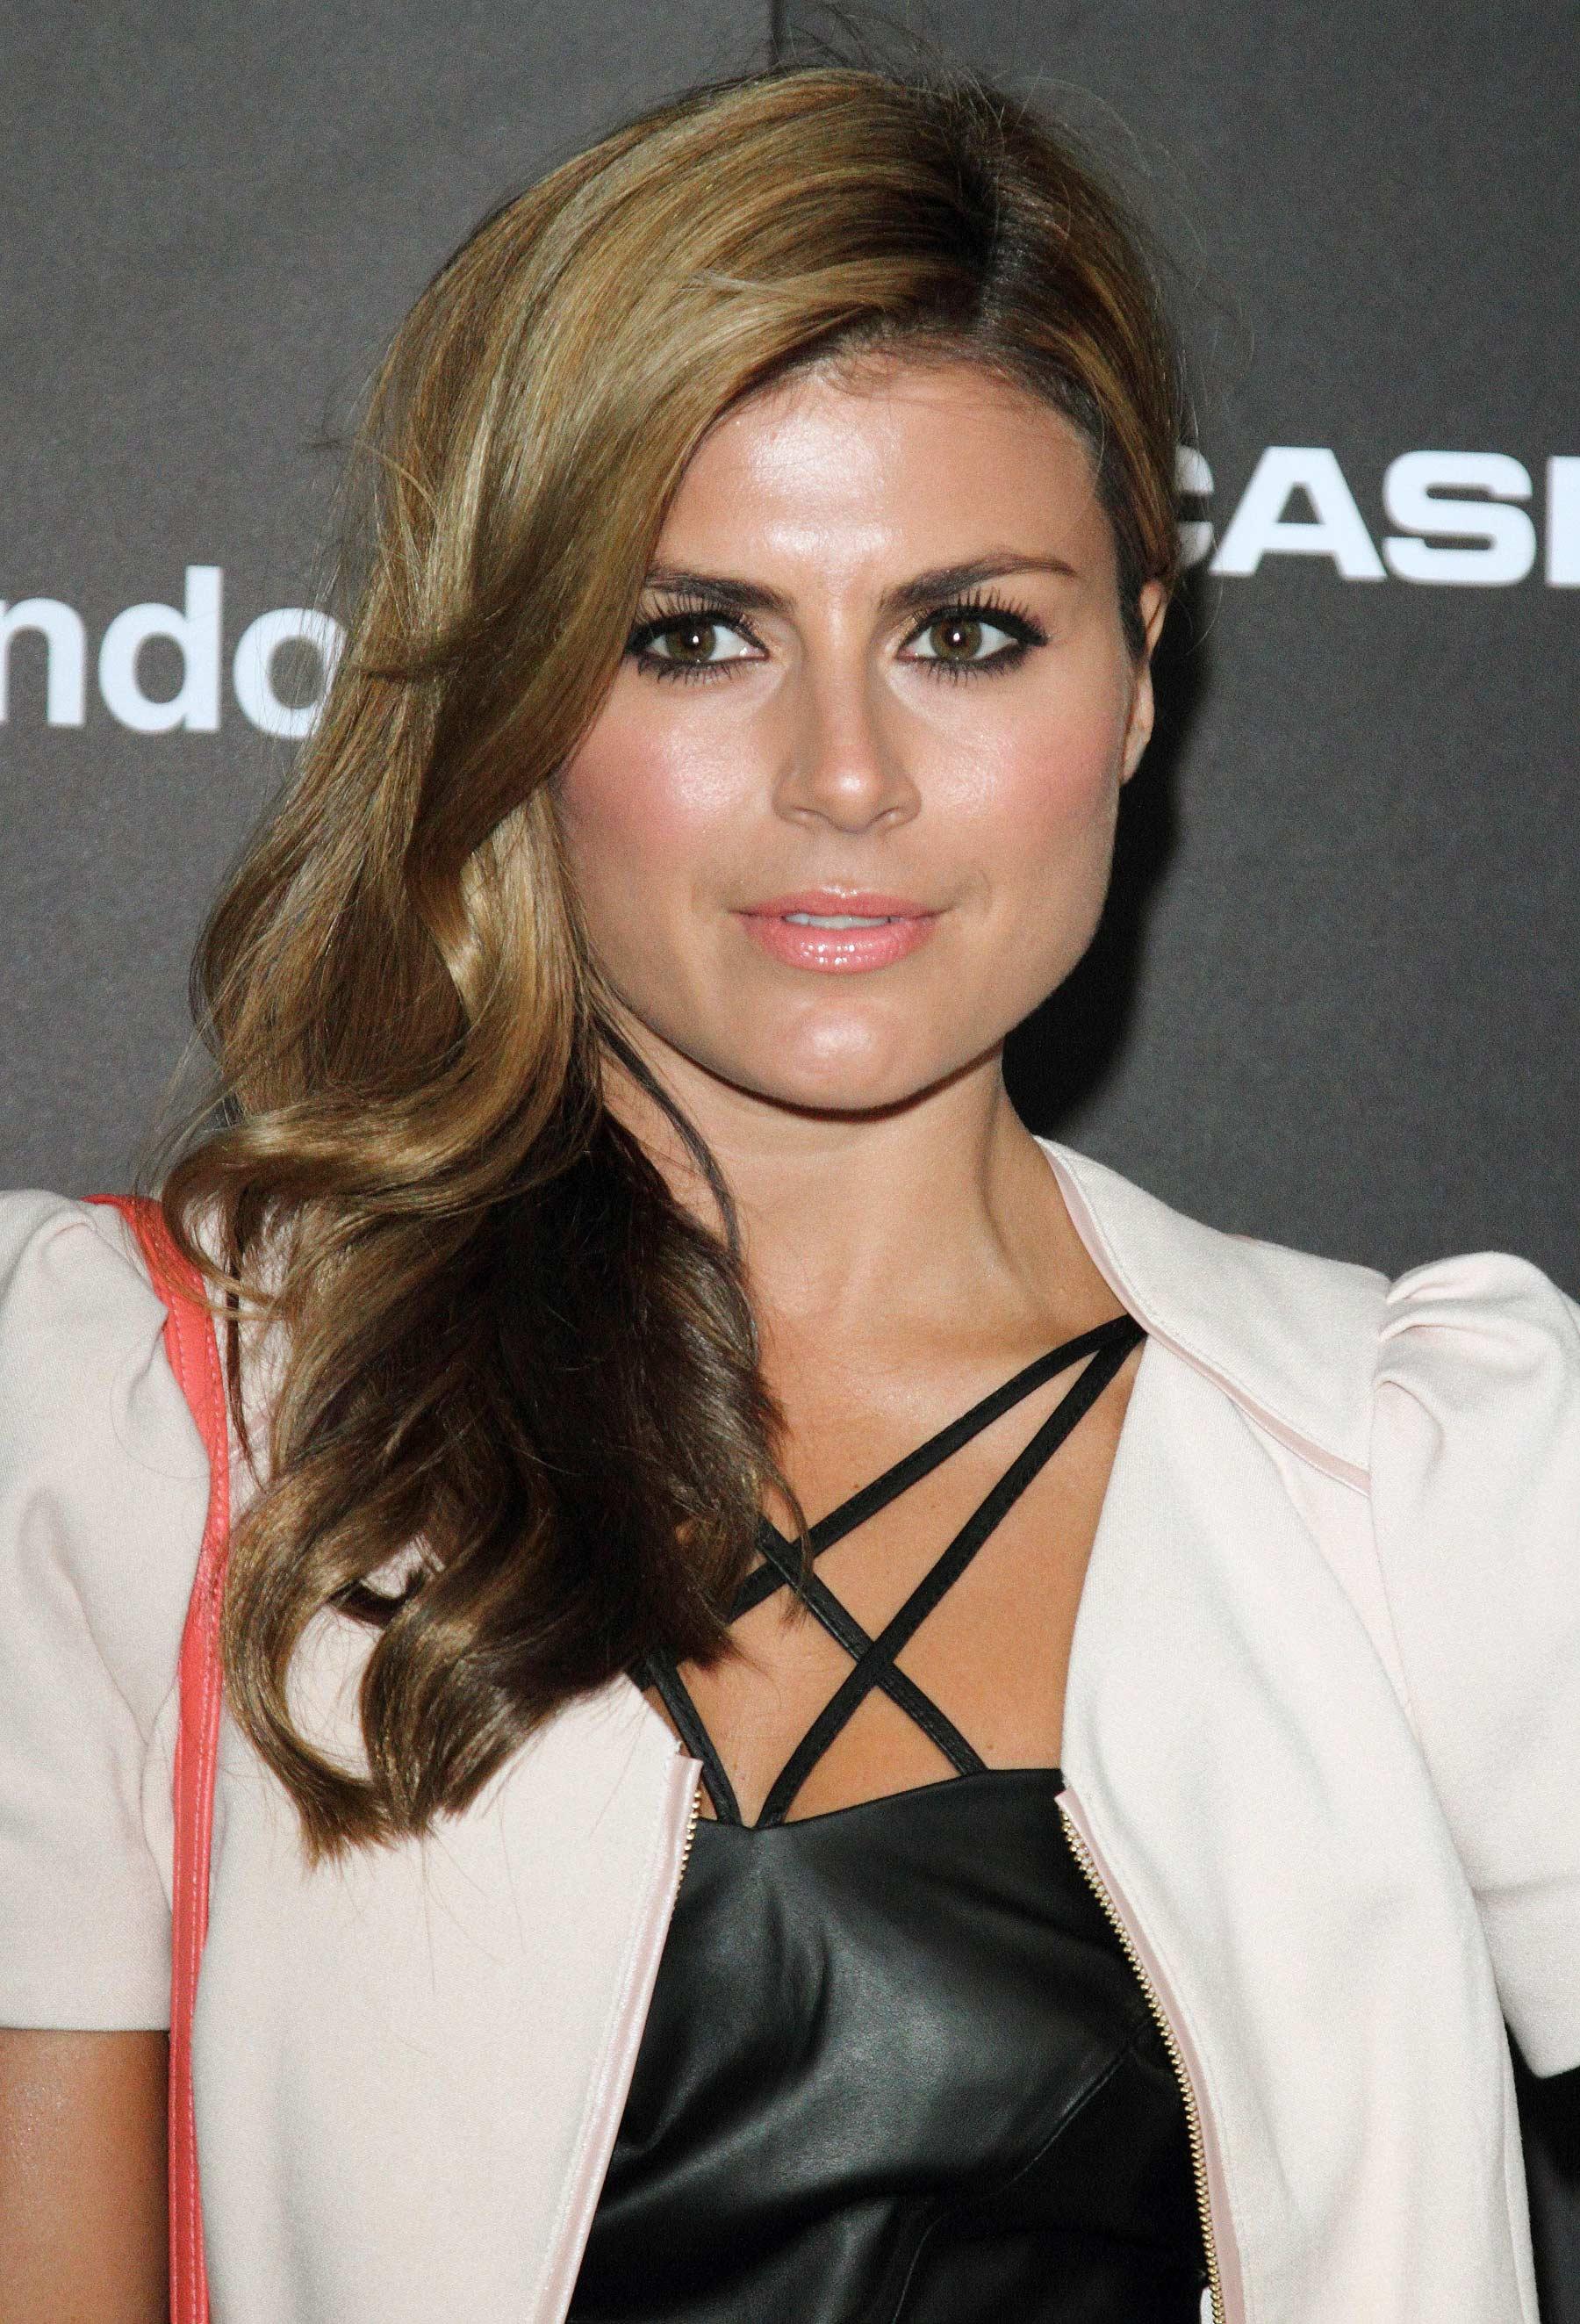 Zoe Hardman attends Casio London Store 1st Birthday Party